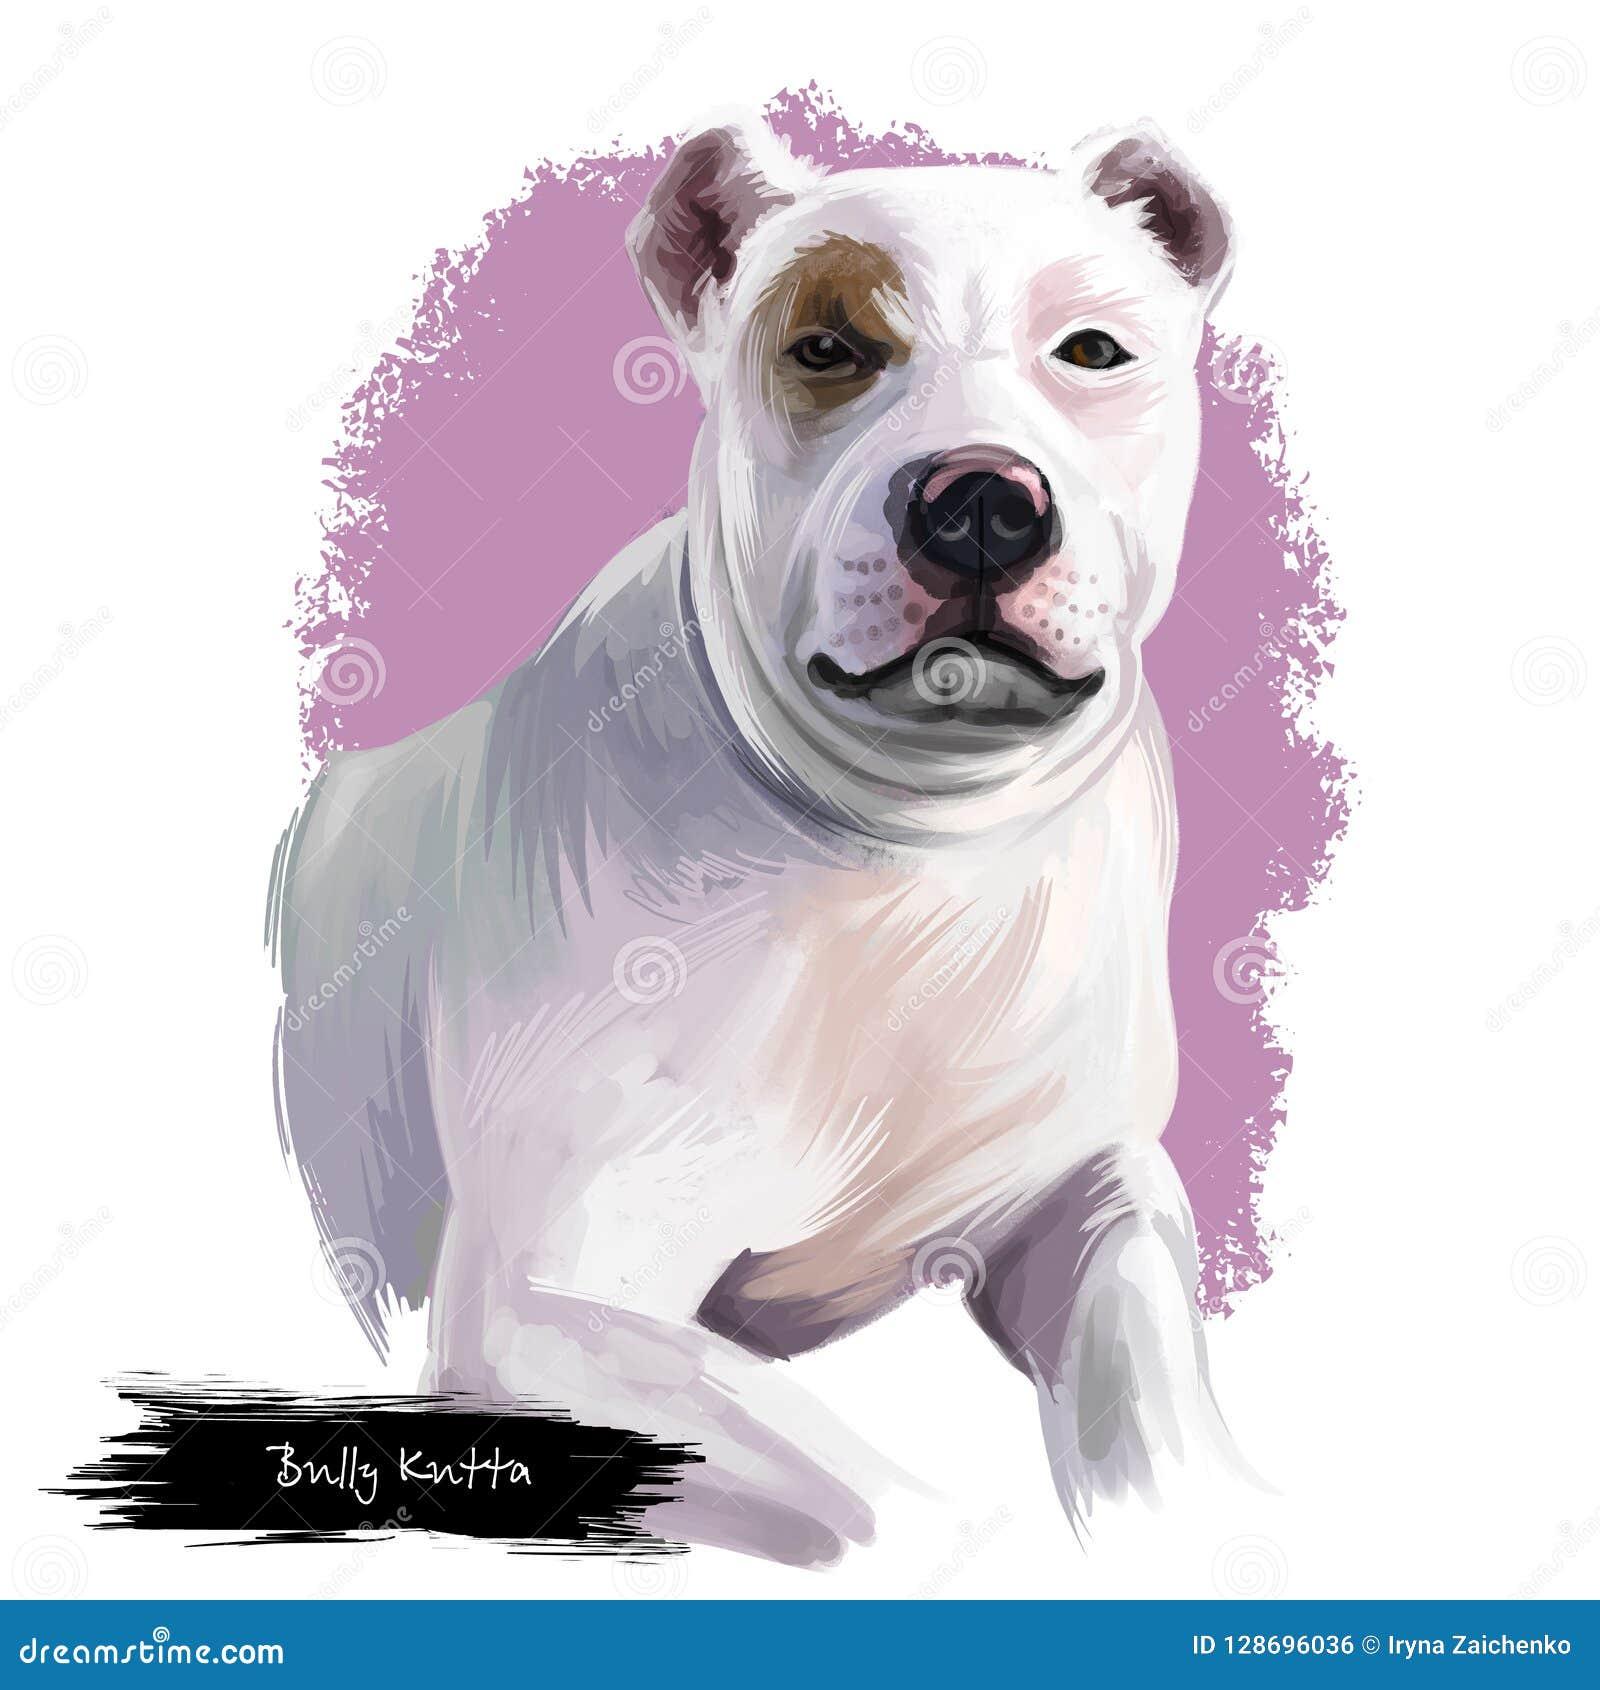 Bully Kutta Dog Breed Isolated On White Background Digital Art